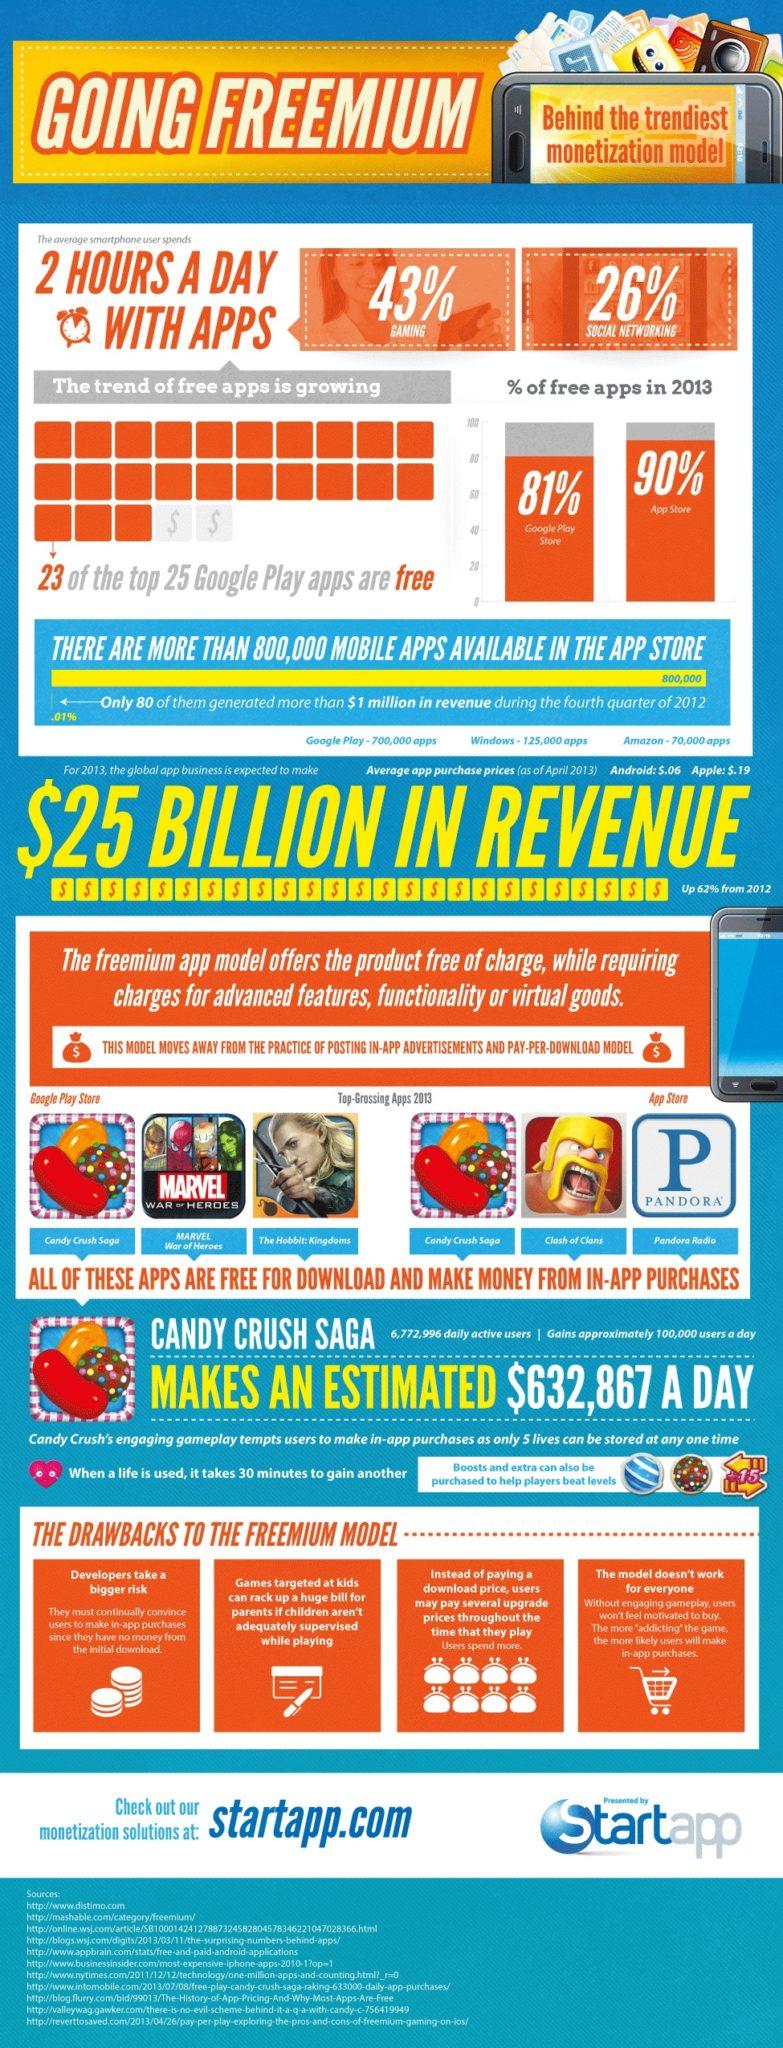 Startapp-freemium-in-app-purchasesv5a